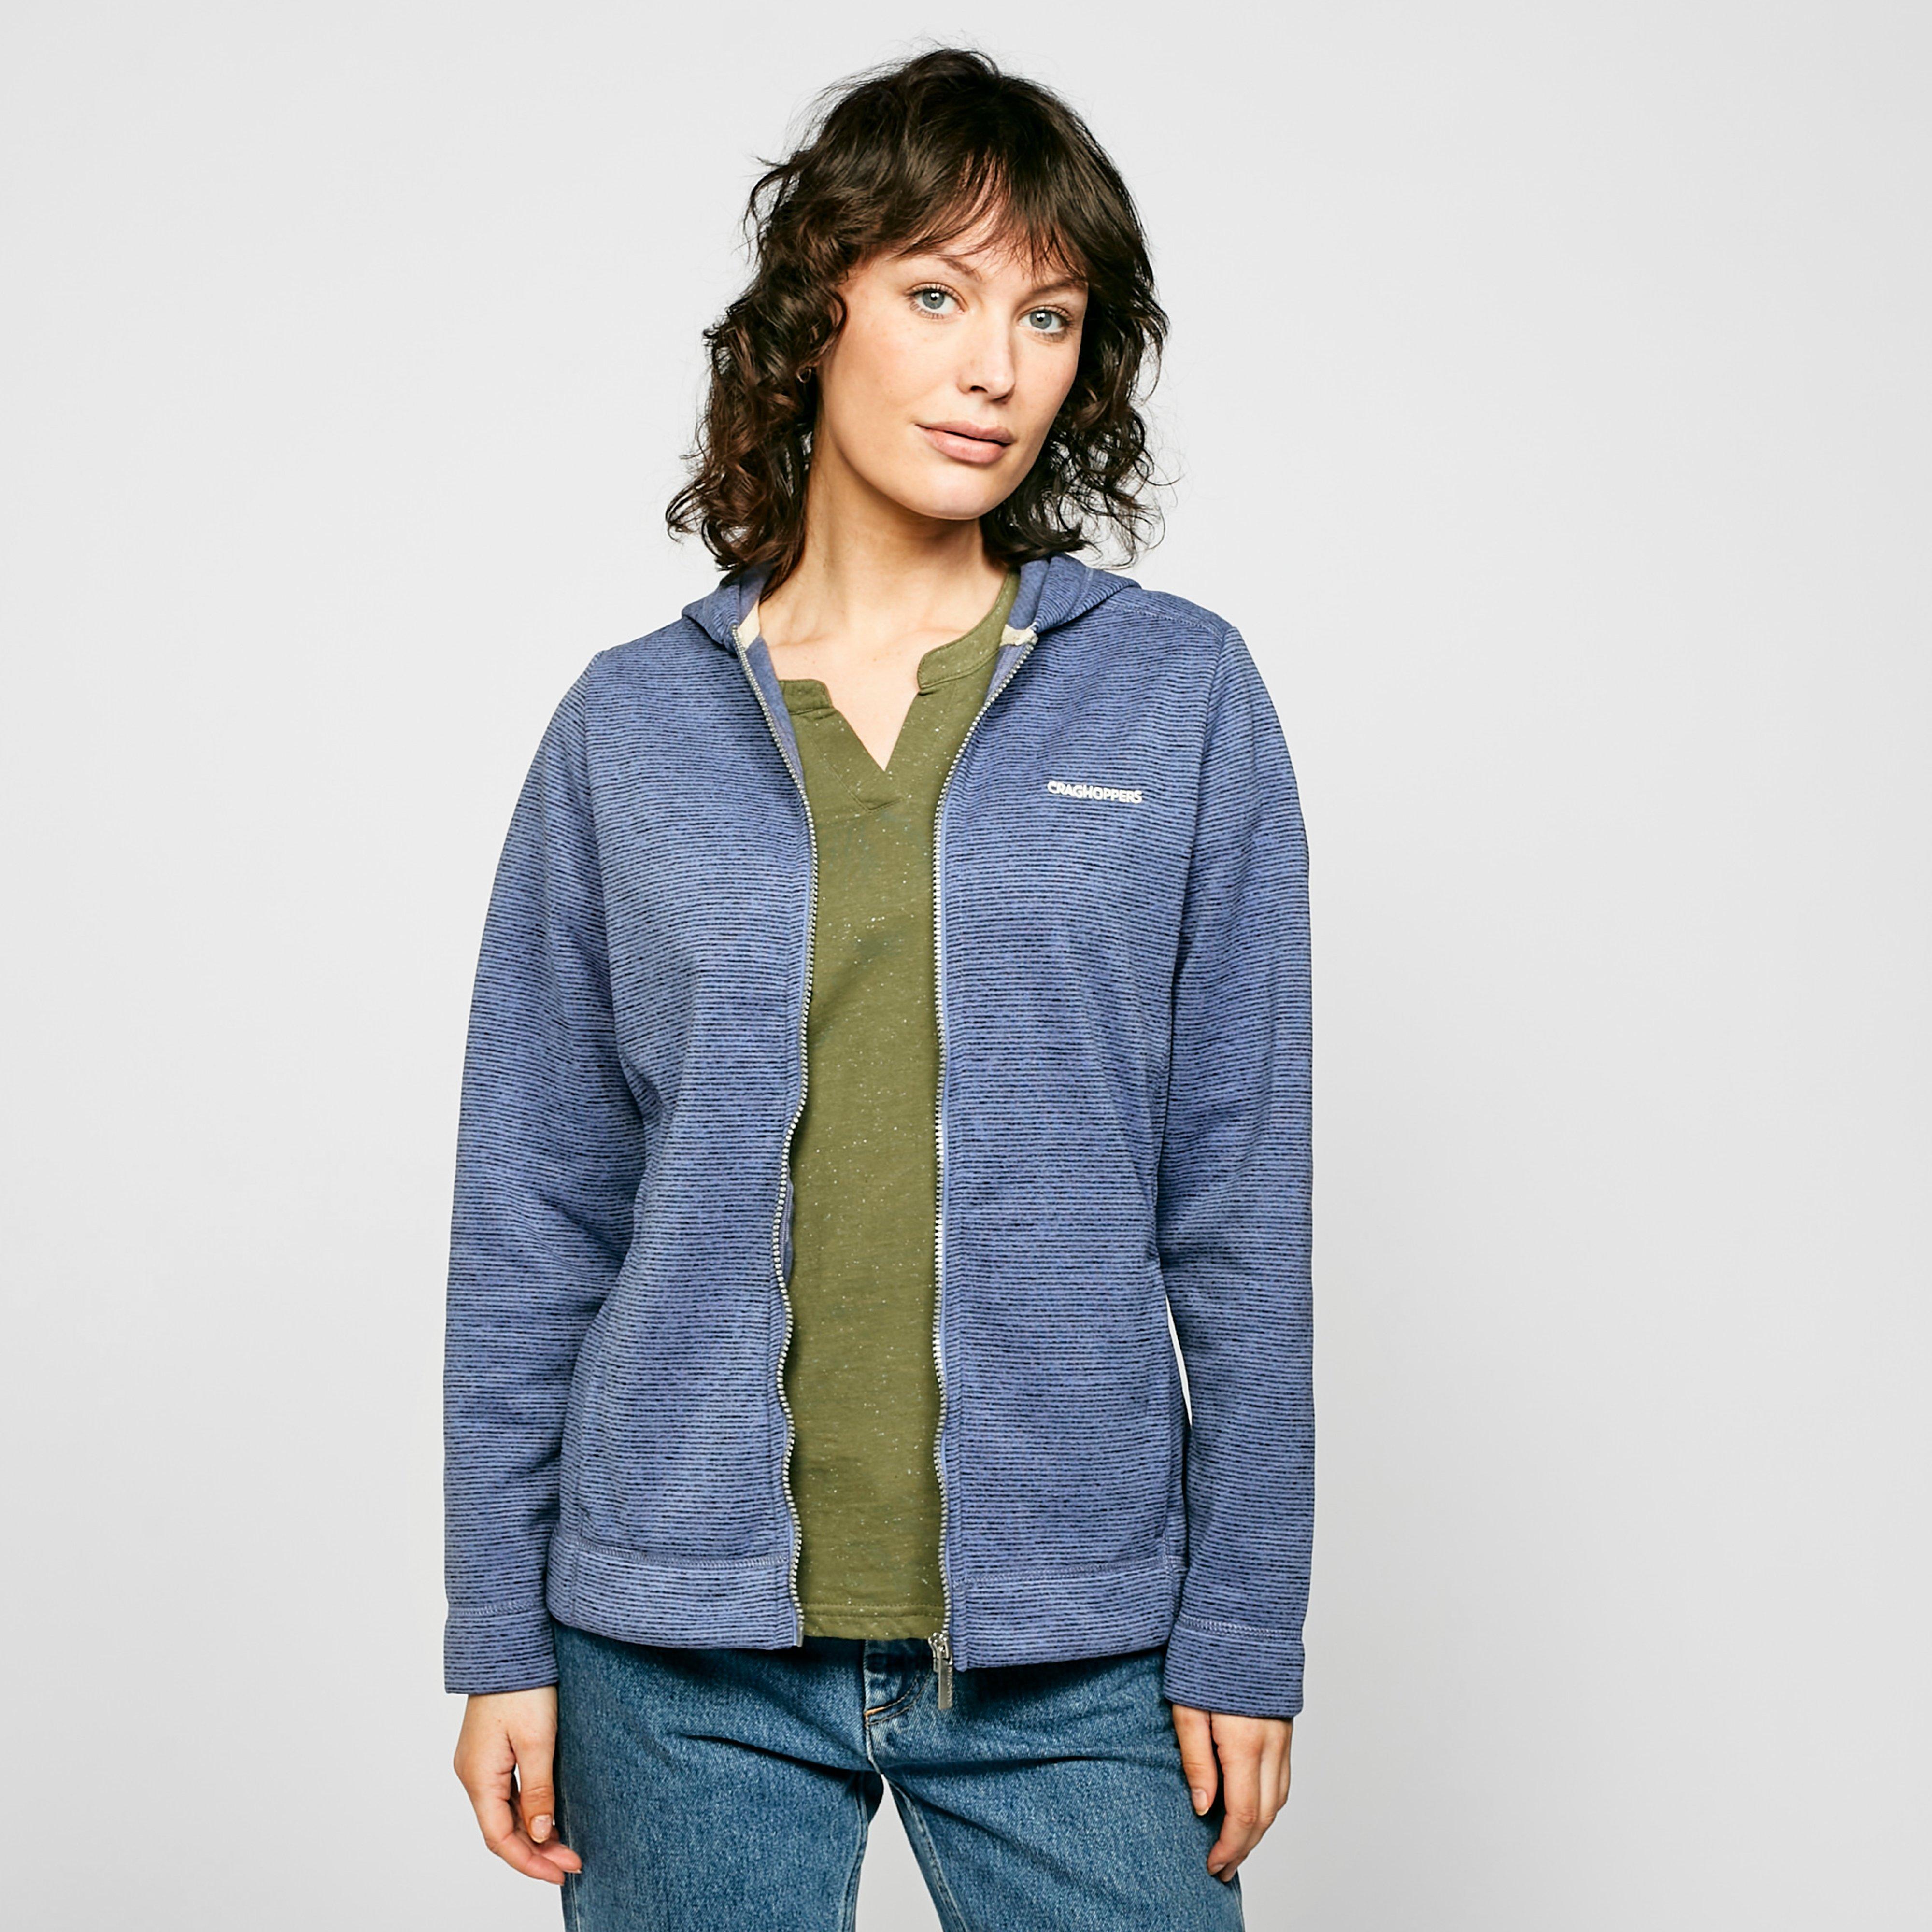 Craghoppers Craghoppers womens Croftly Full-Zip Hooded Fleece